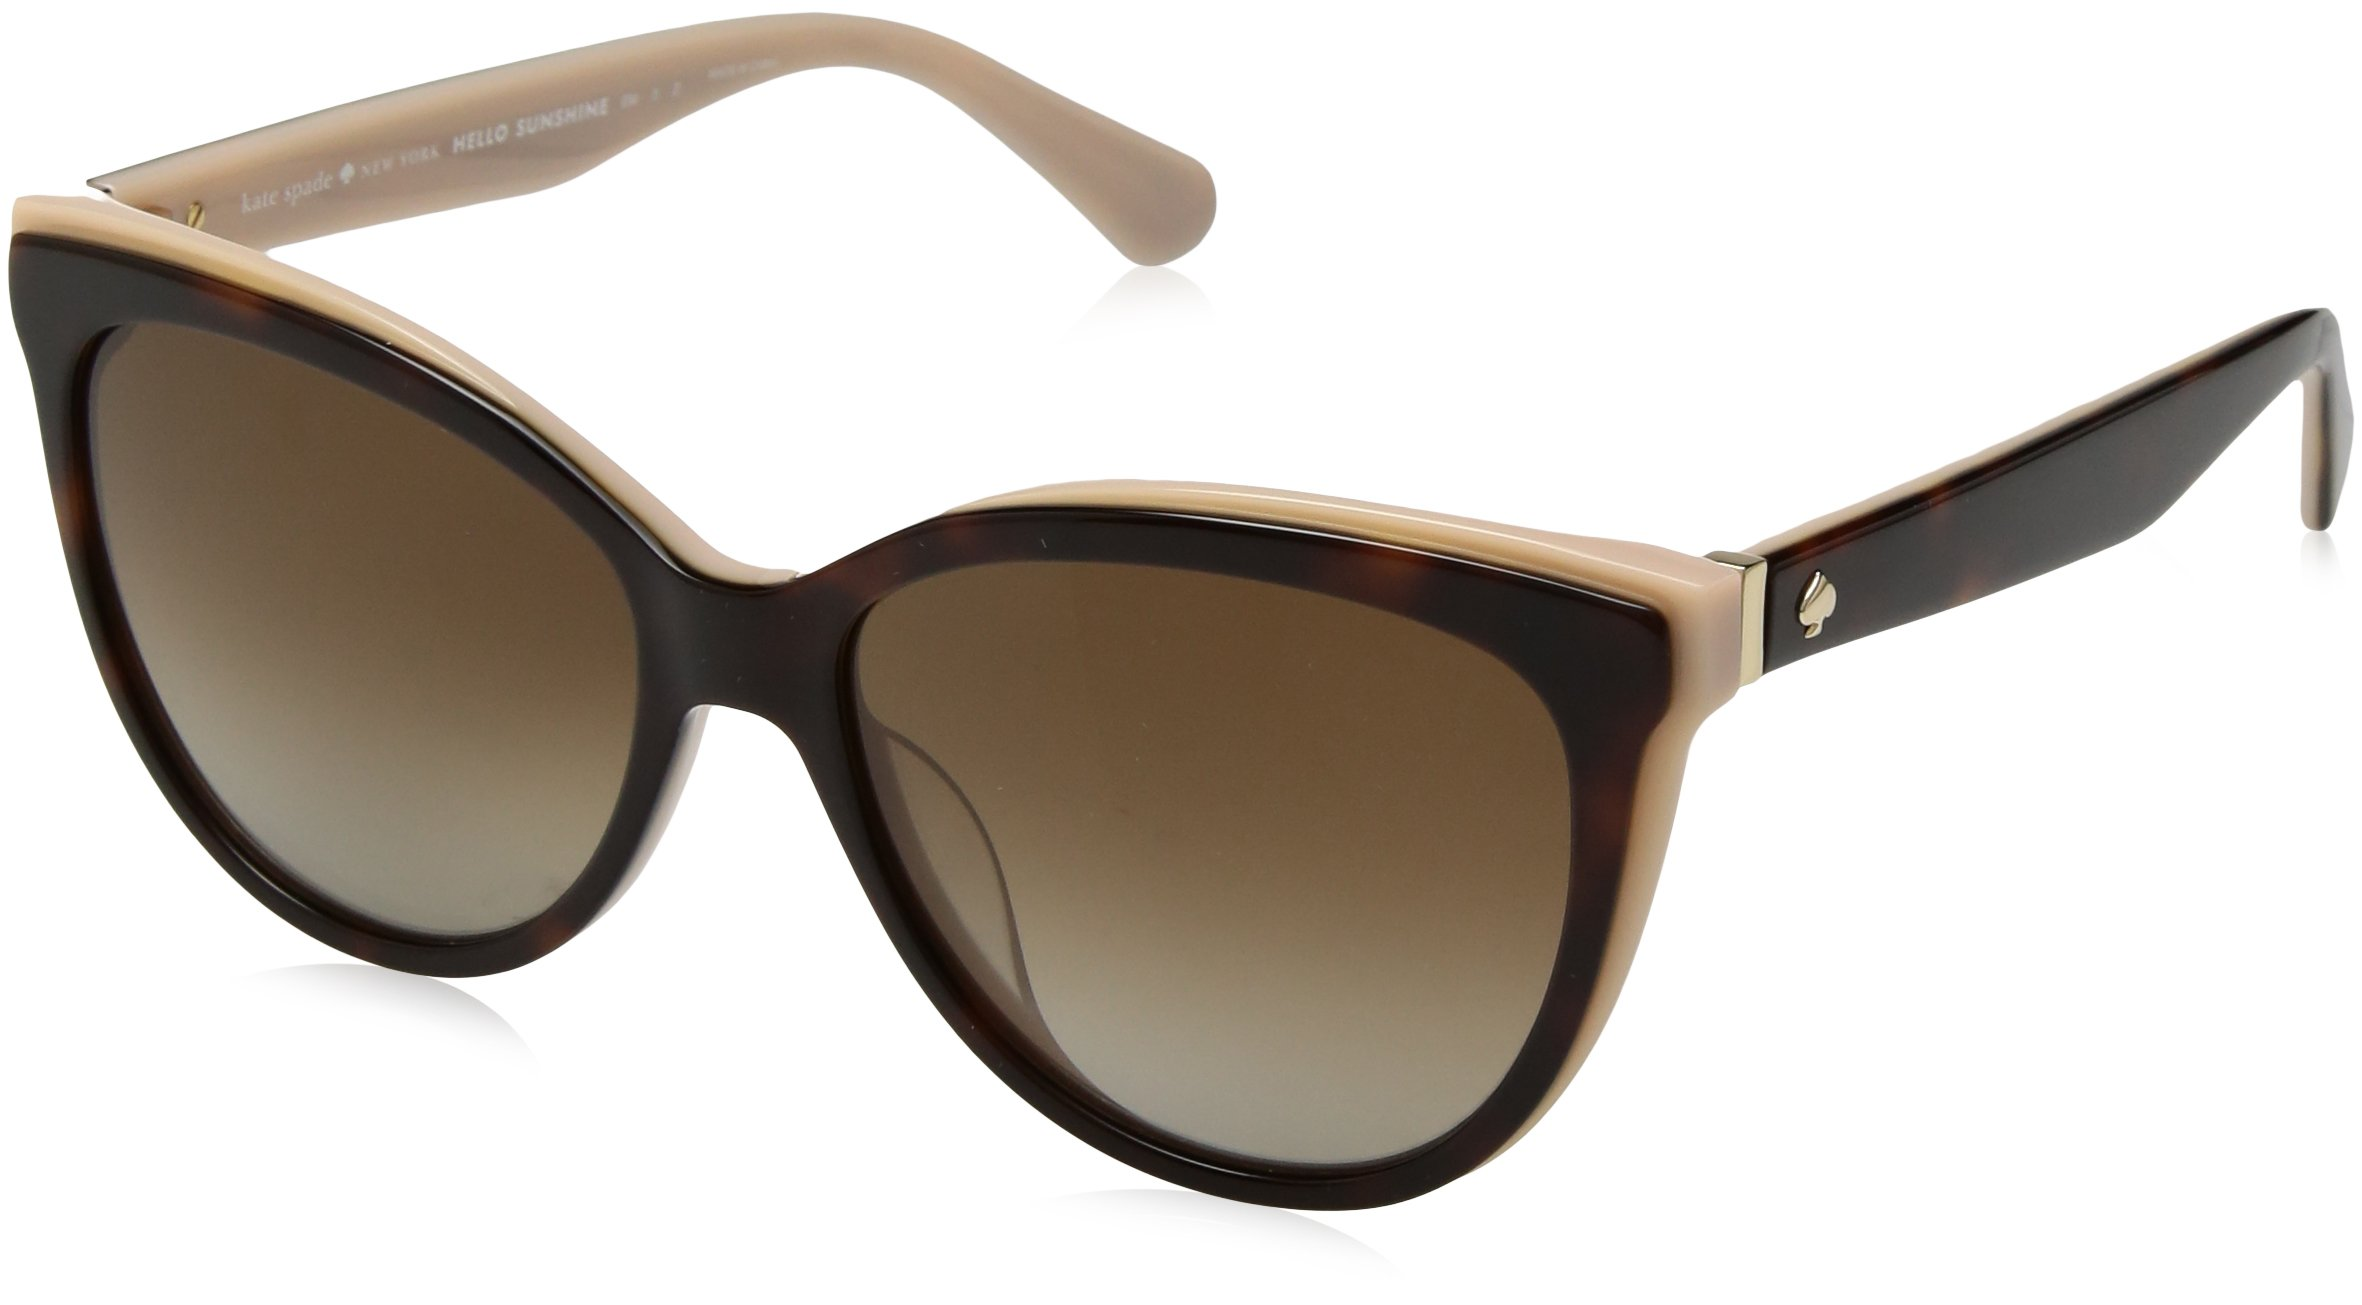 Kate Spade Women's Daesha/s Polarized Round Sunglasses, Havana Pink, 56 mm by Kate Spade New York